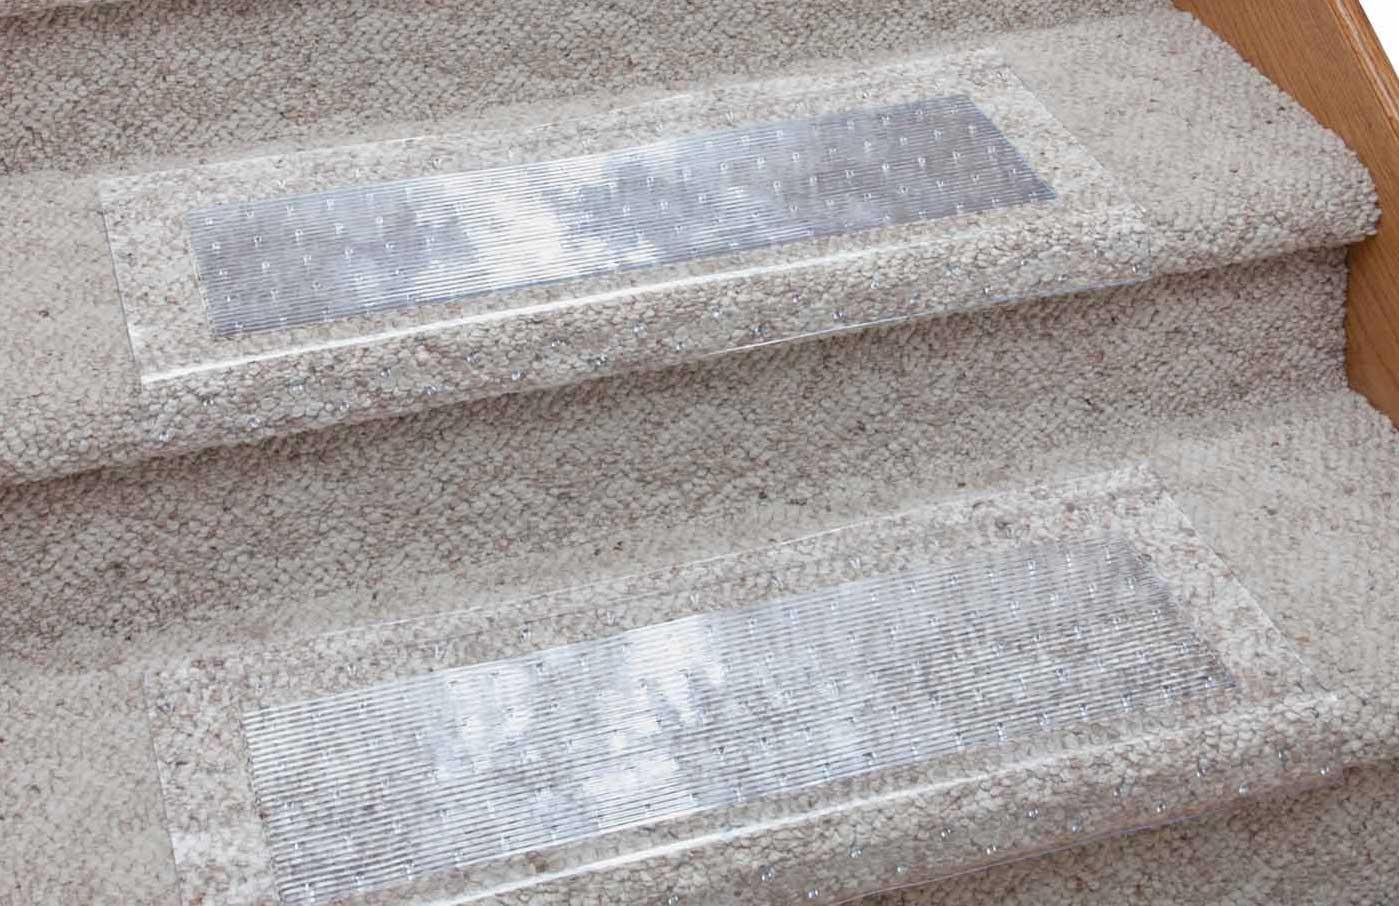 Vinyl Carpet Protector On Stairs Interior Home Design Regarding Stair Tread Carpet Covers (#20 of 20)